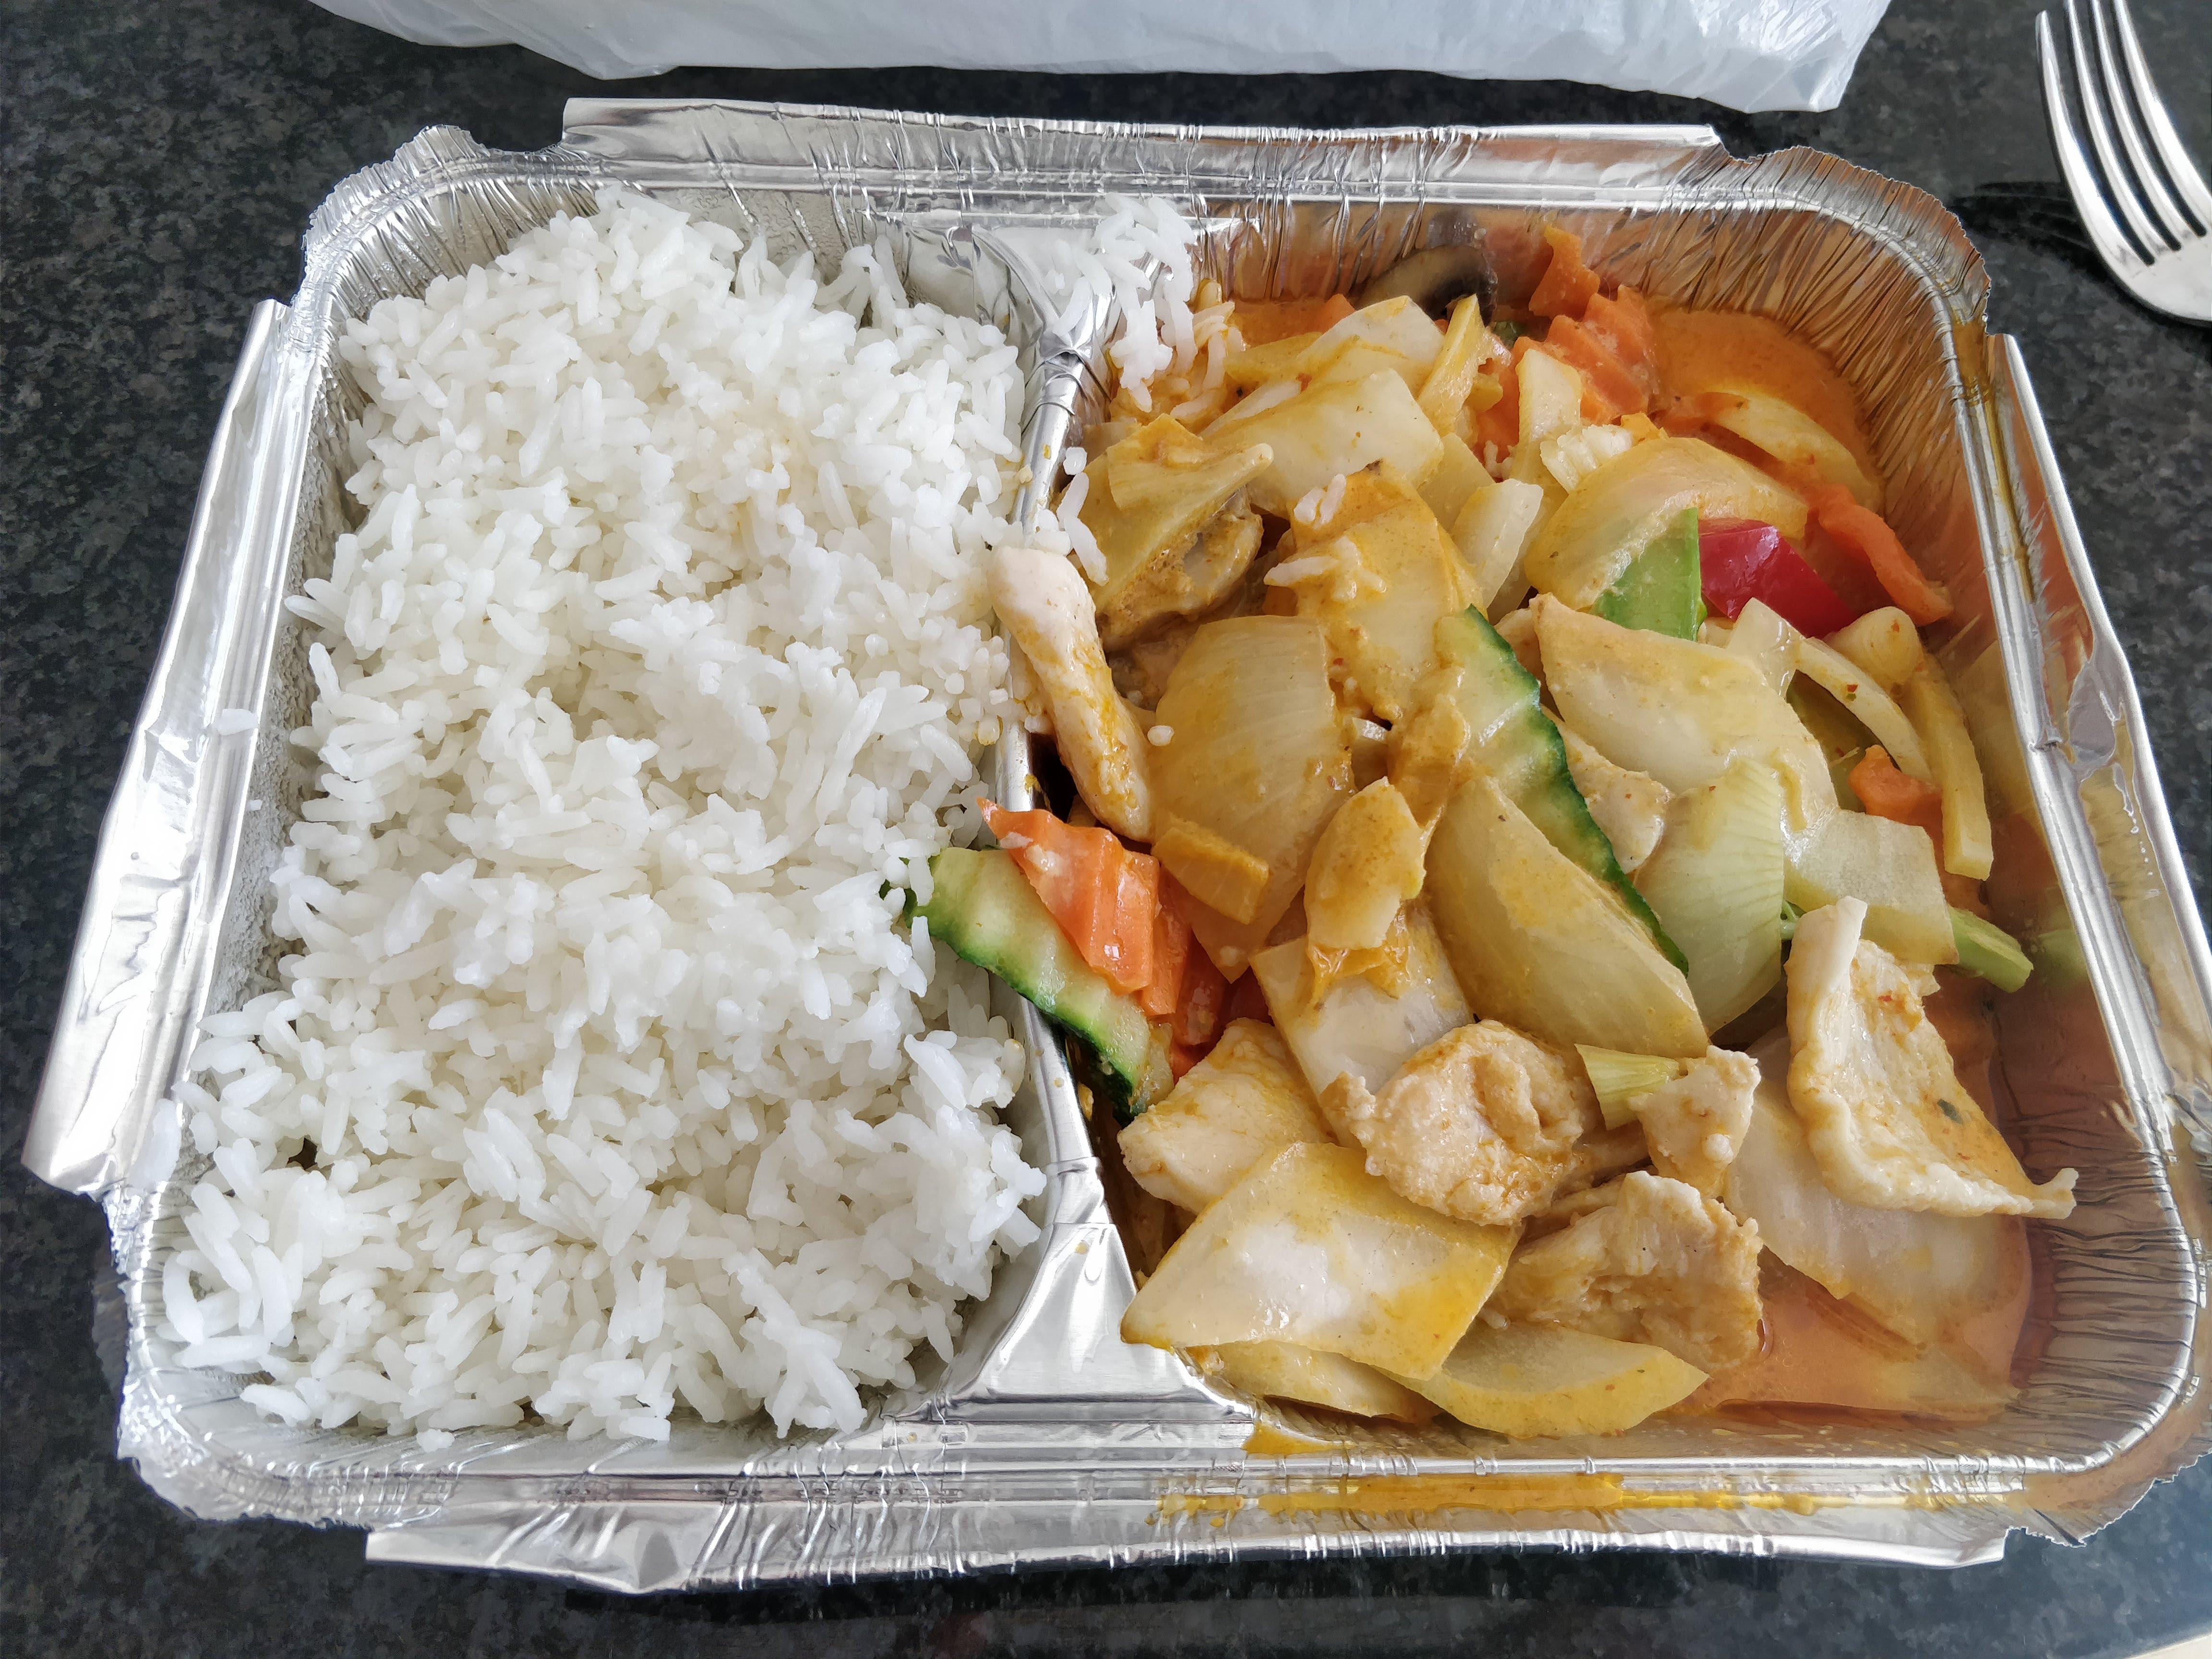 http://foodloader.net/nico_2018-04-07_asiatisch-mit-reis.jpg